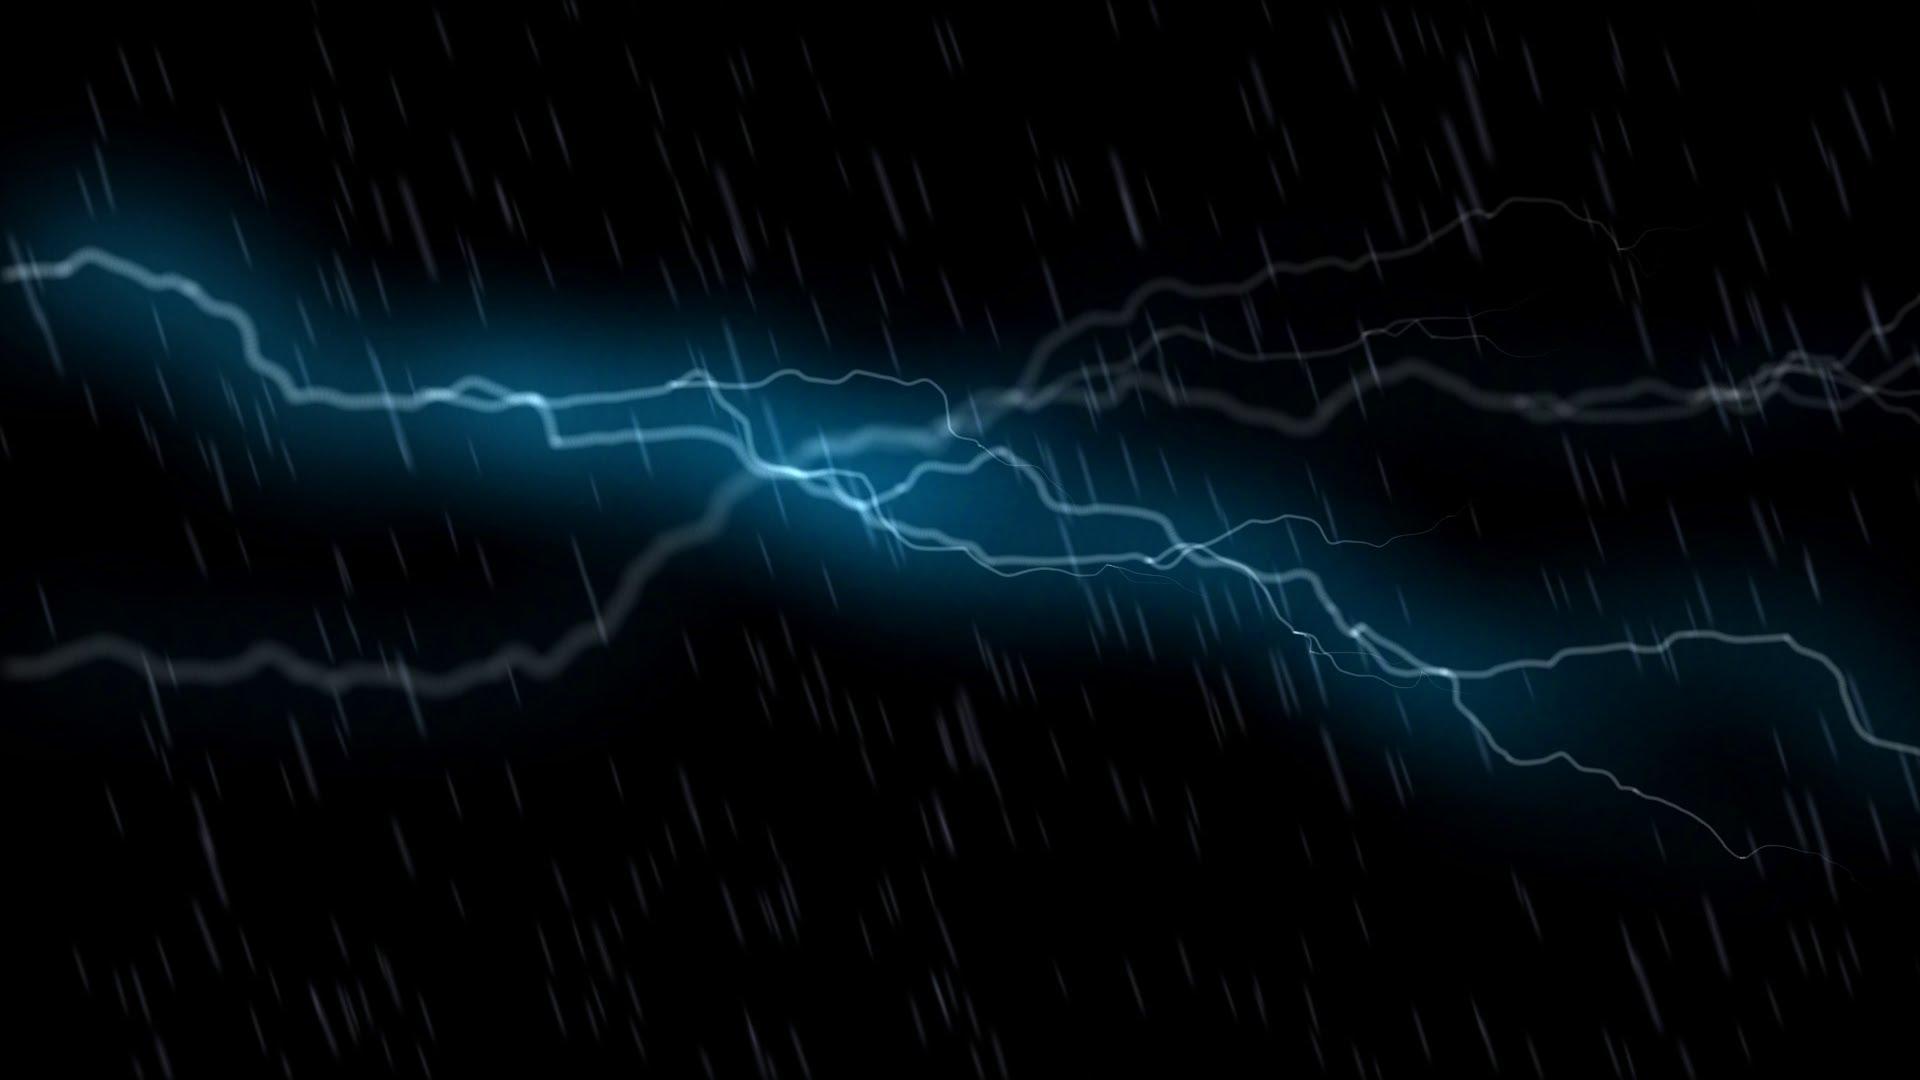 Thunder Storm and Rain Animation   HD Stock Footage 1920x1080